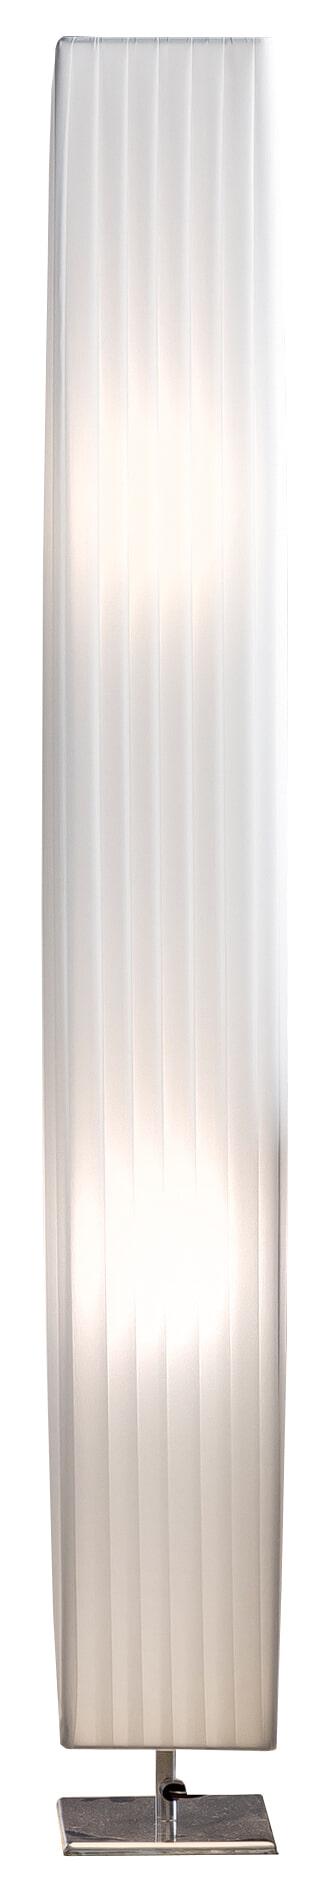 Artistiq Vloerlamp 'Lina' 120cm hoog